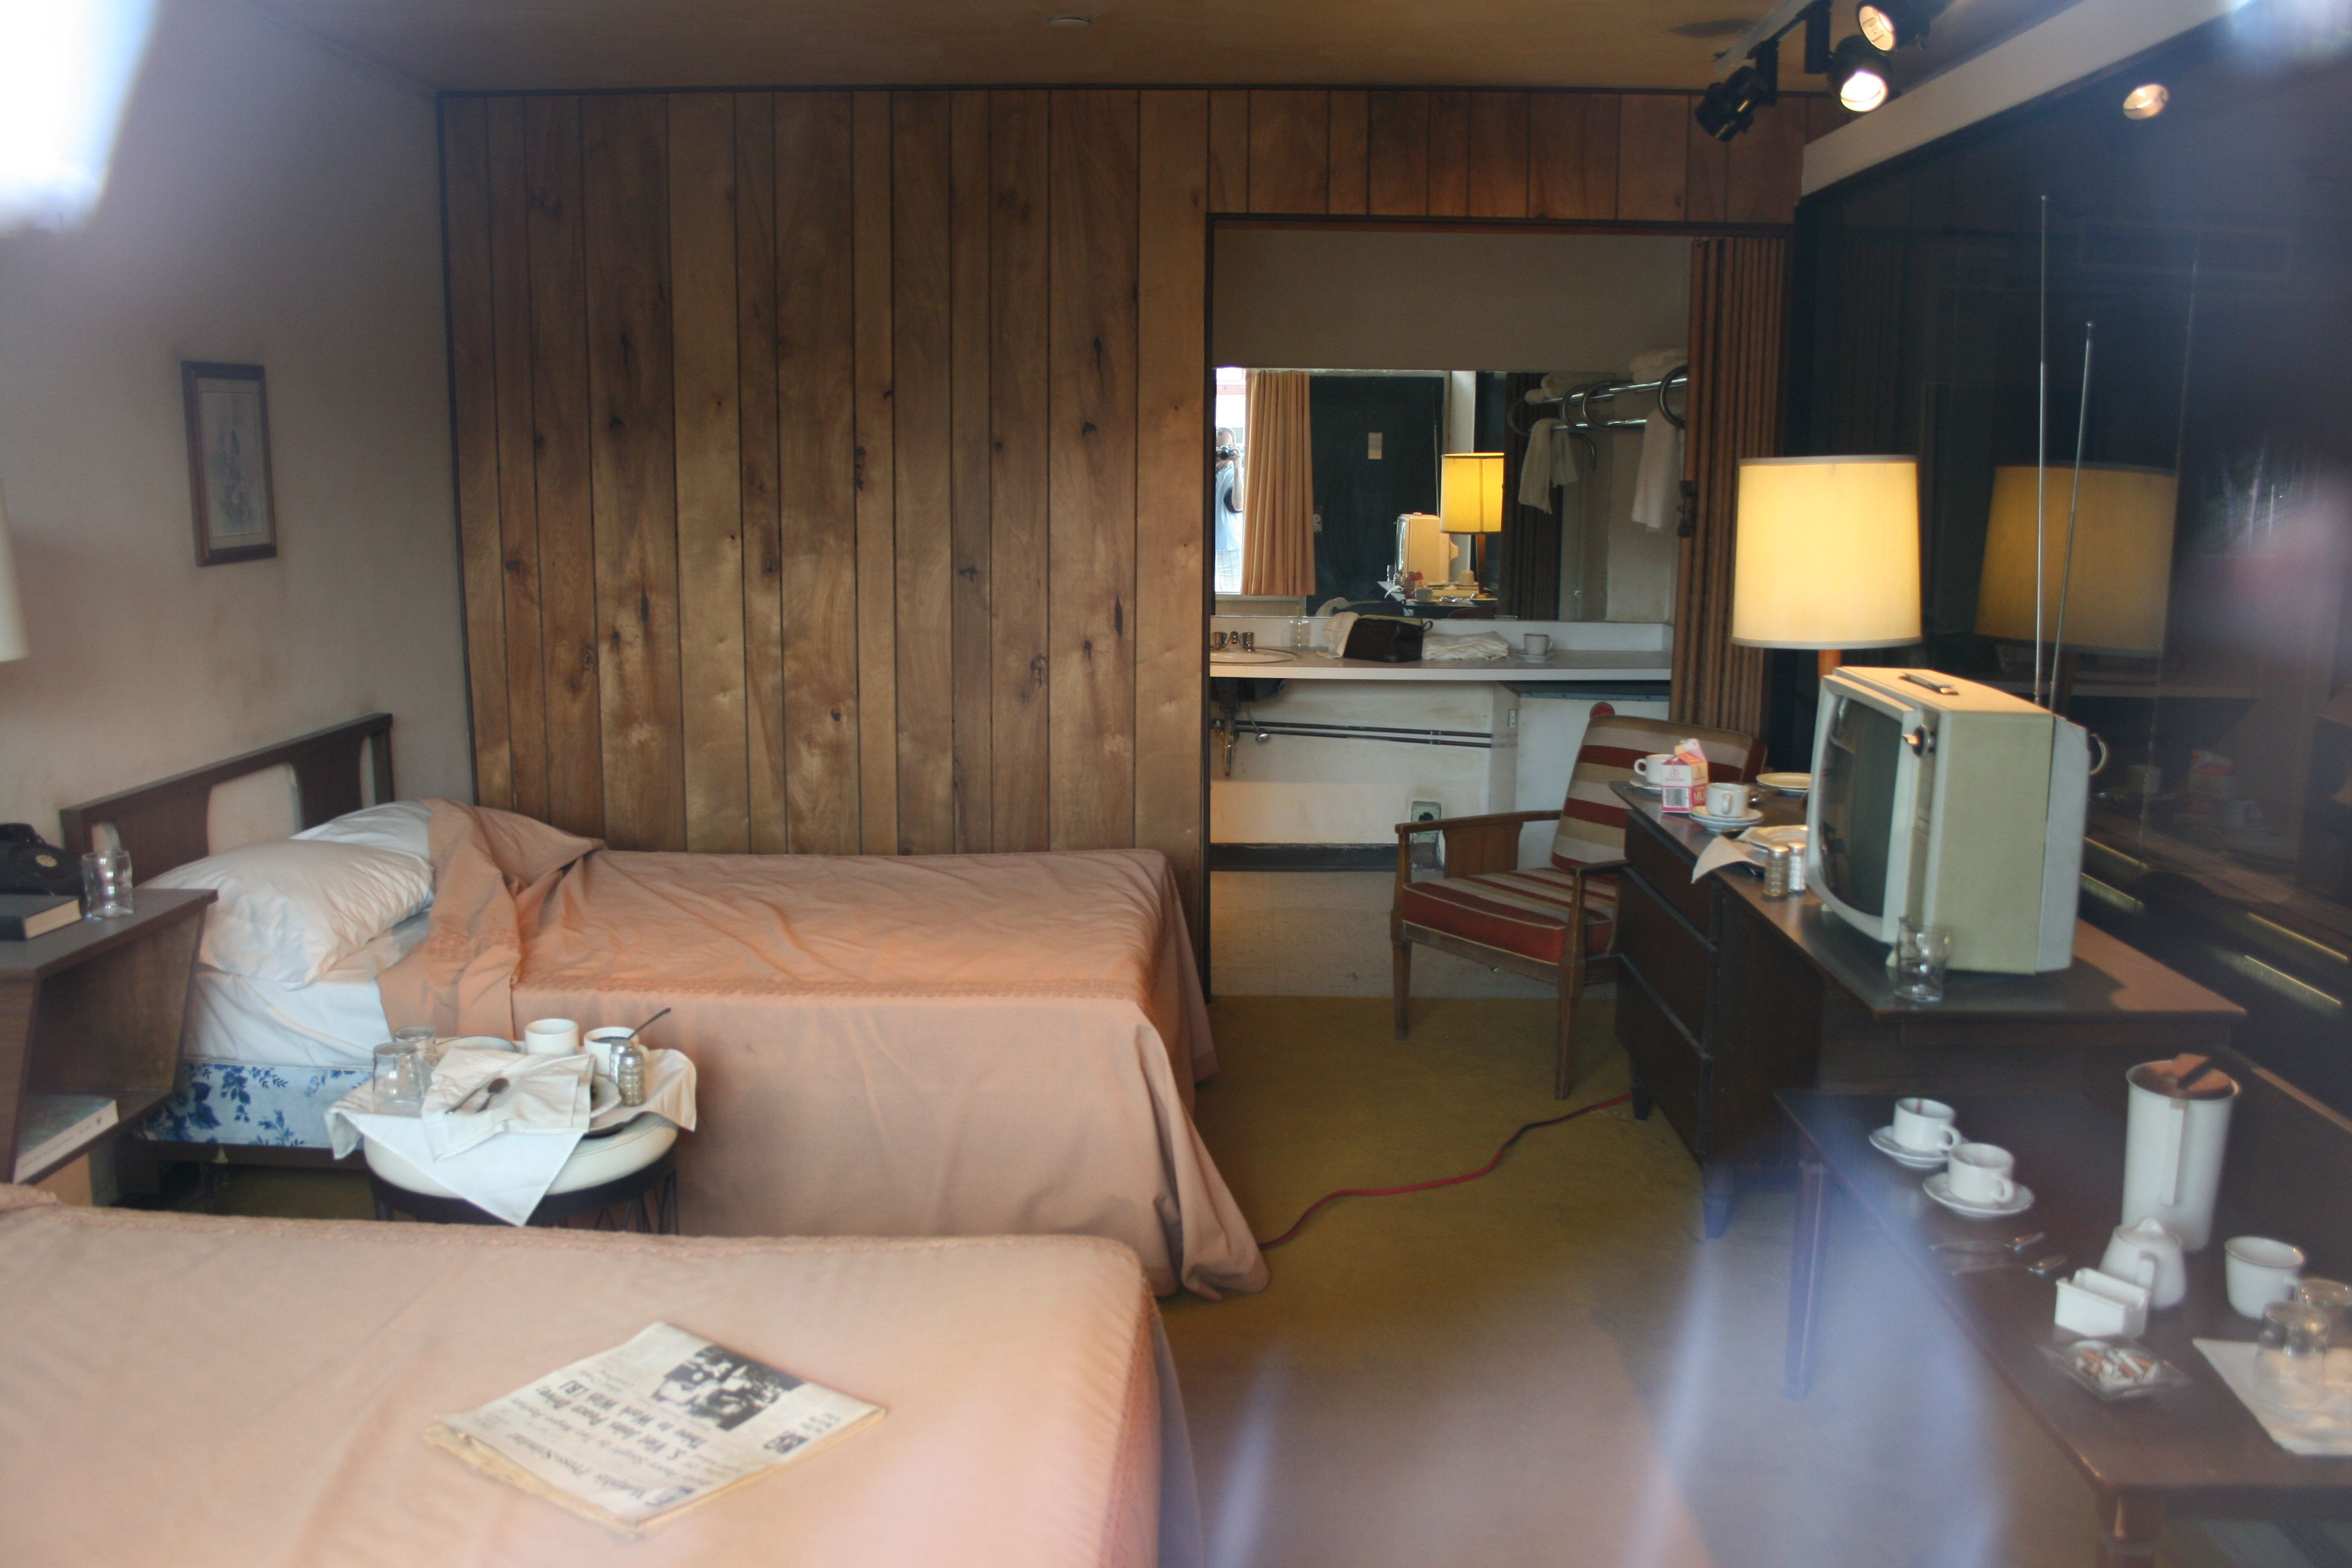 Pcs Blog The Lorraine Motel Portland Center Stage Mountaintop Setting Pinterest Black History